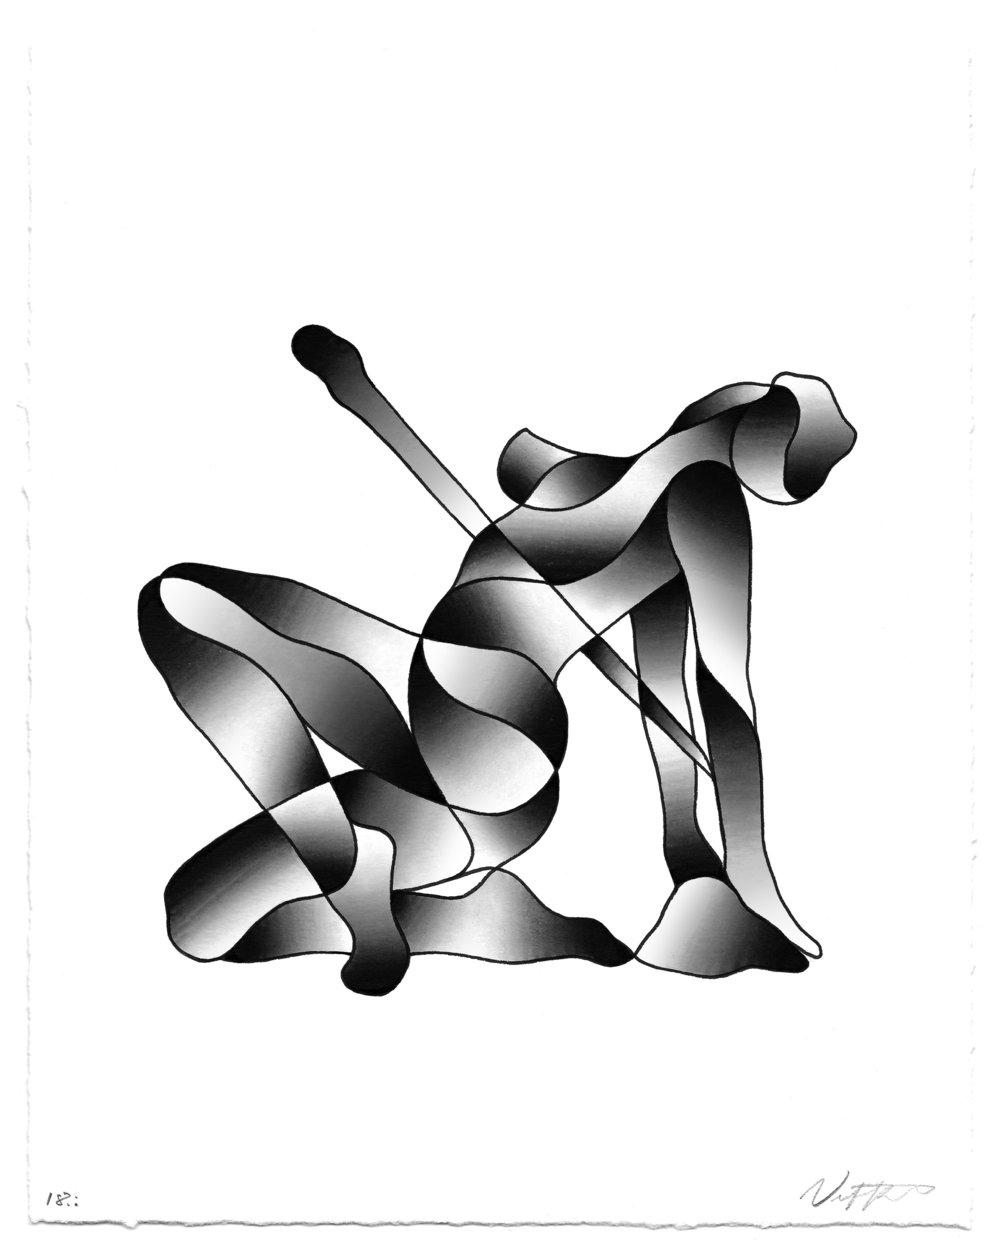 Figure_64.jpg